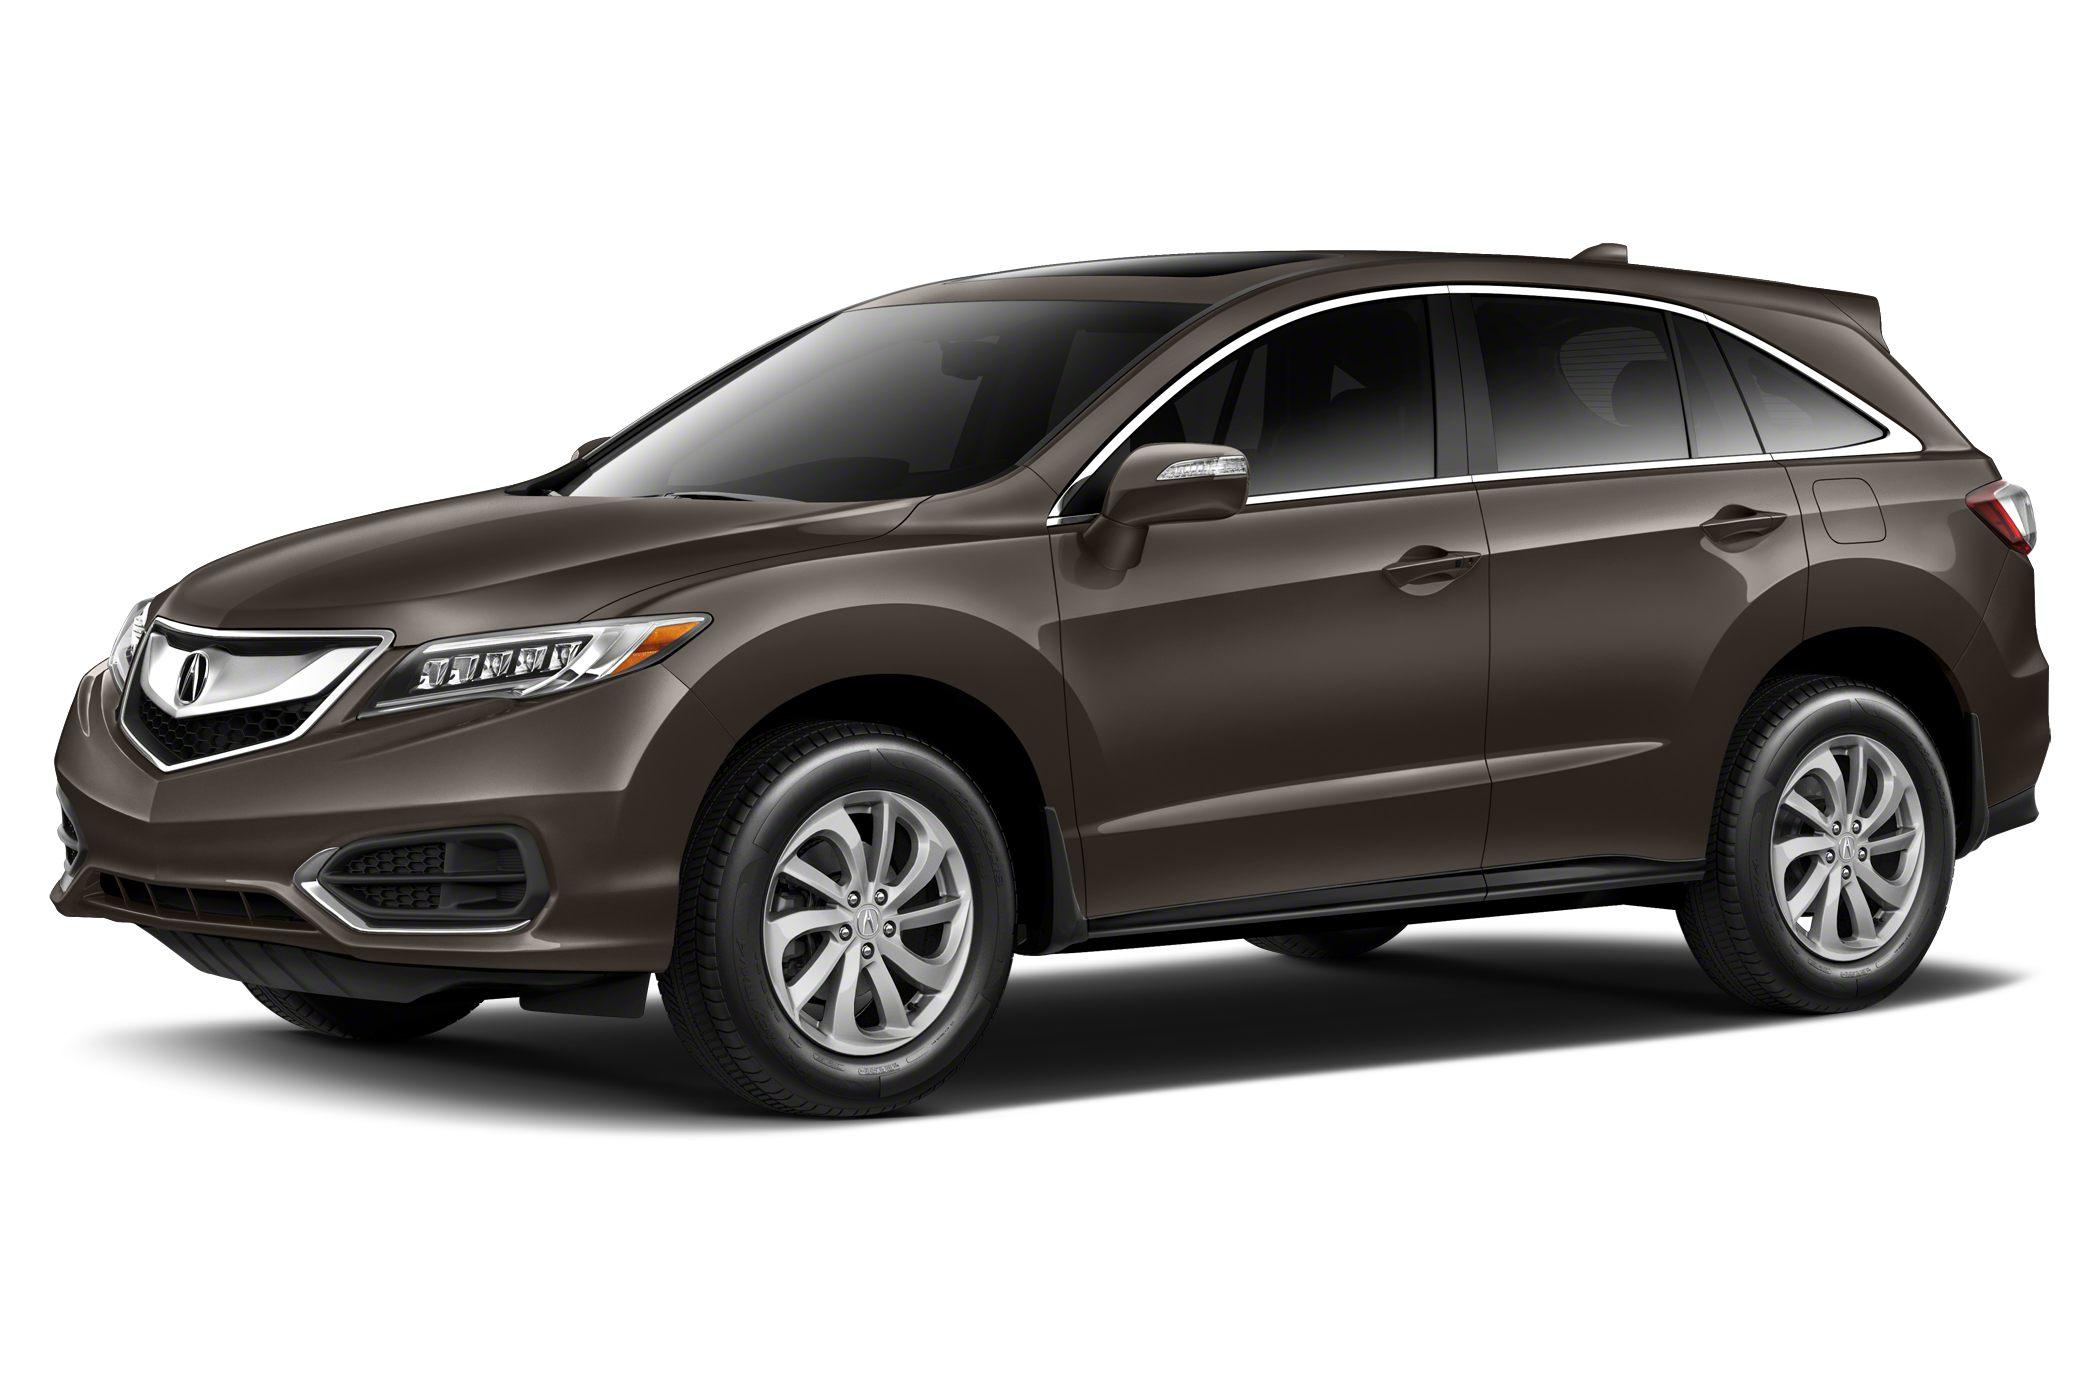 Rdx Vs Rx350 >> Acura Rdx Vs Mdx | News of New Car Release